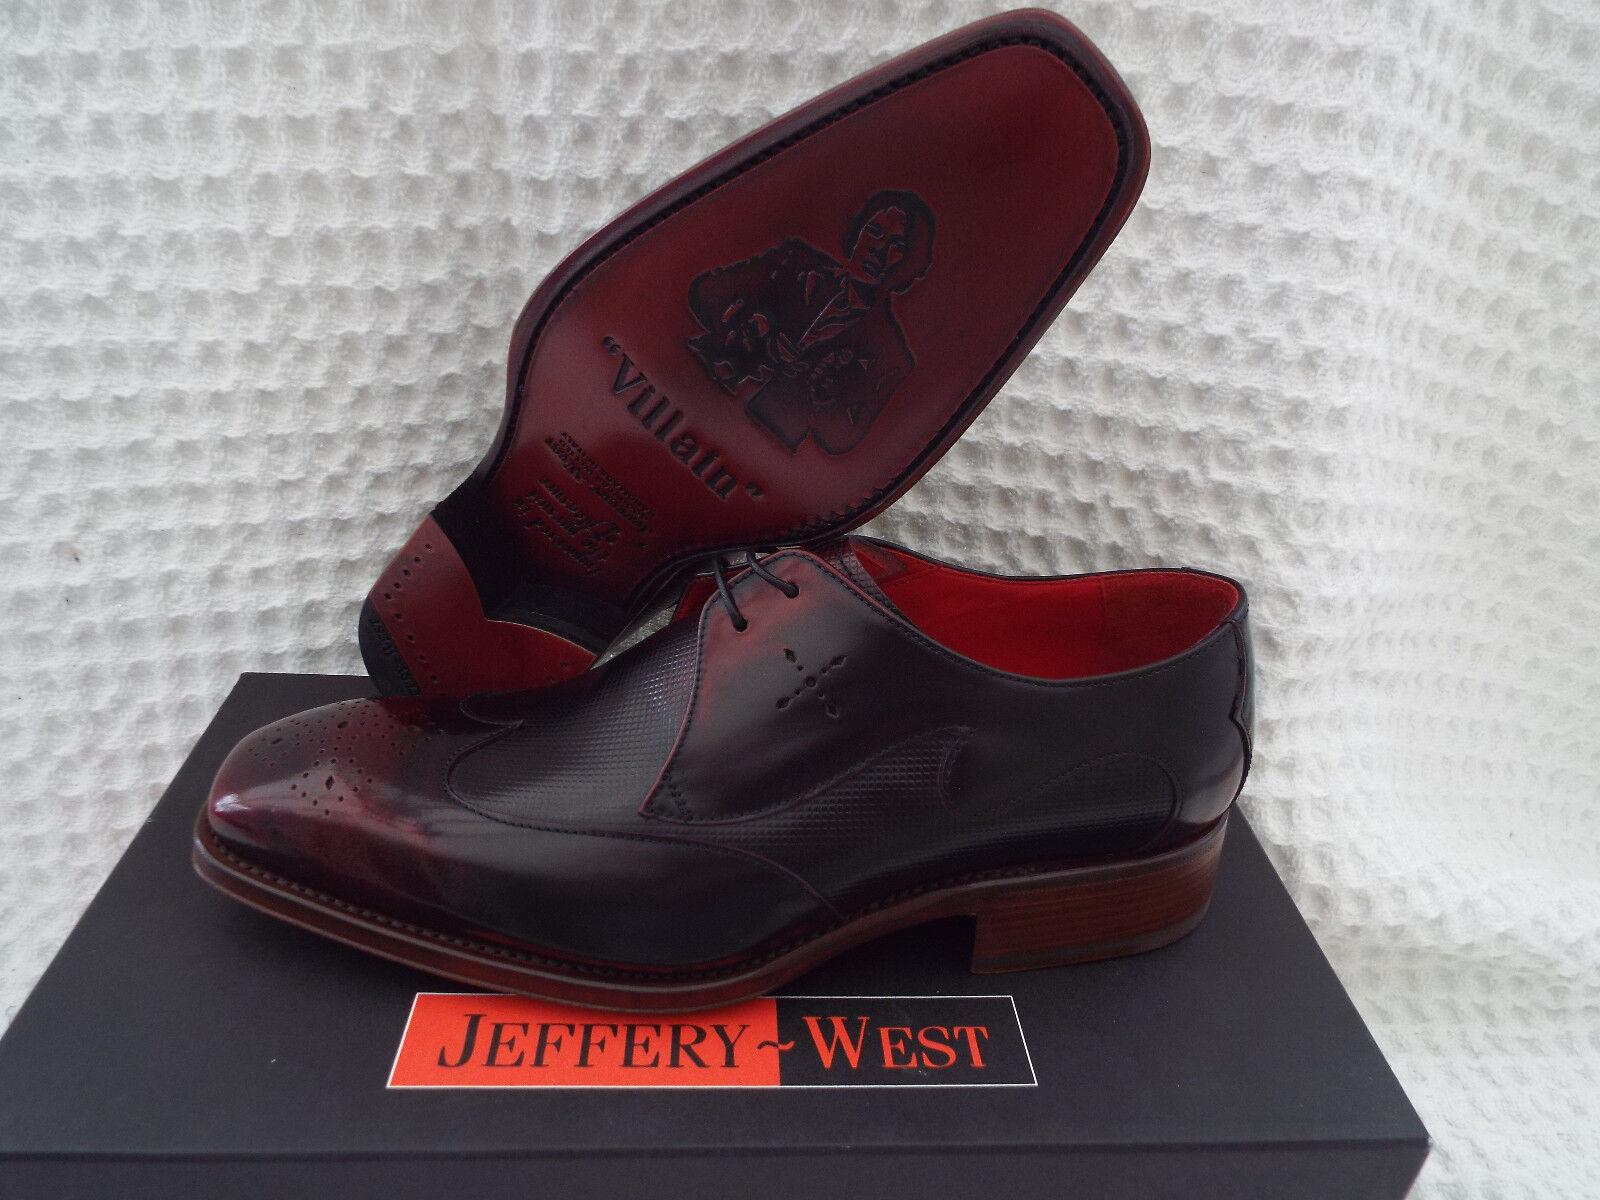 JEFFERY WEST WEST JEFFERY Carter Burgundy Schuhes  dded48